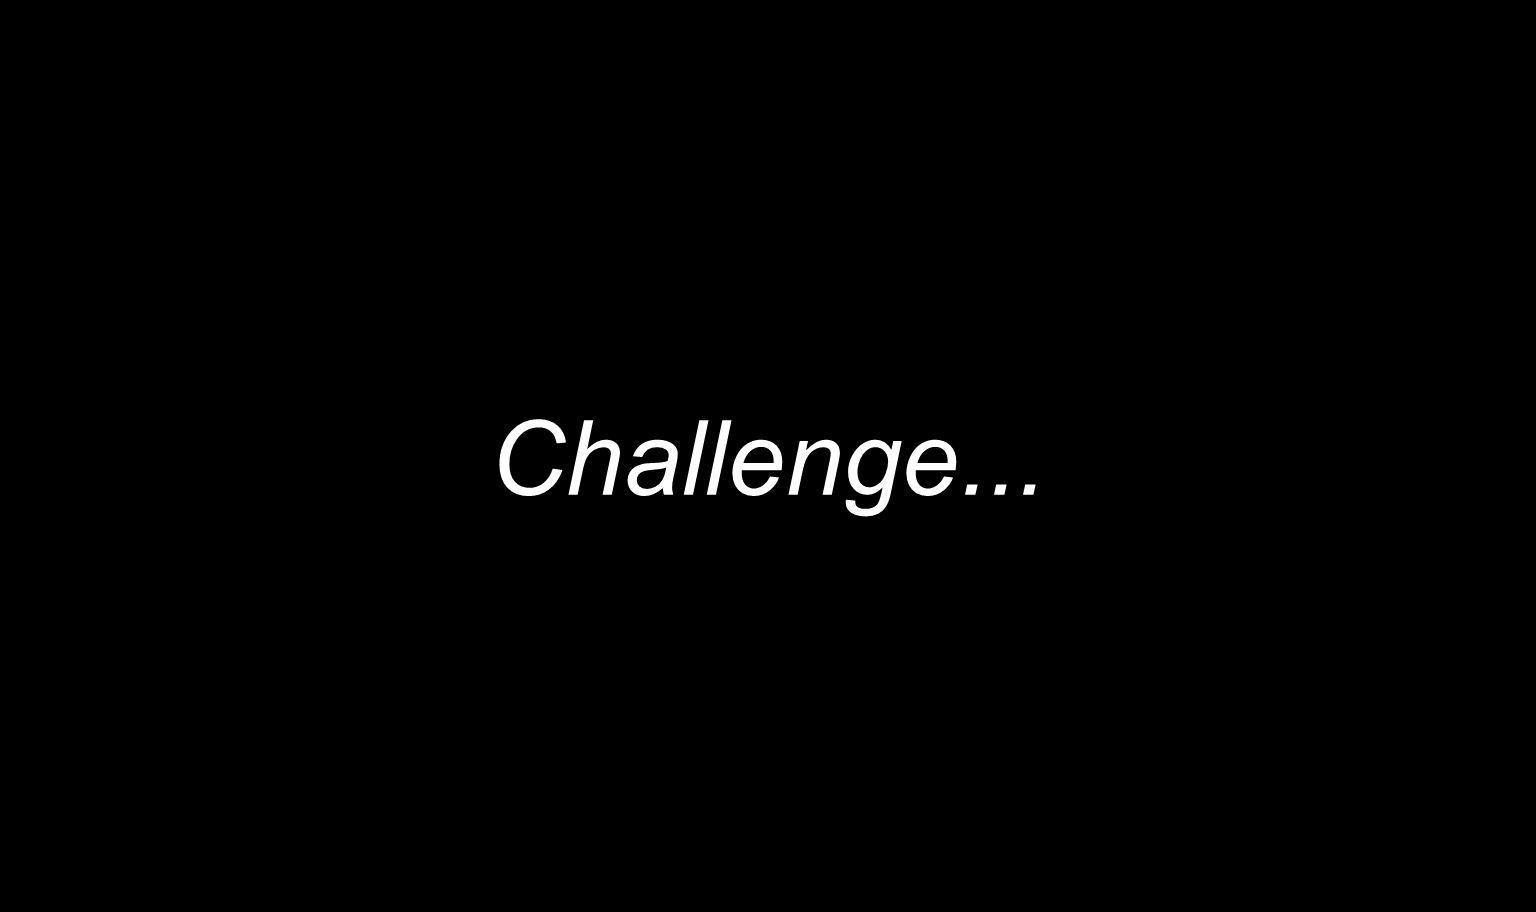 Challenge...